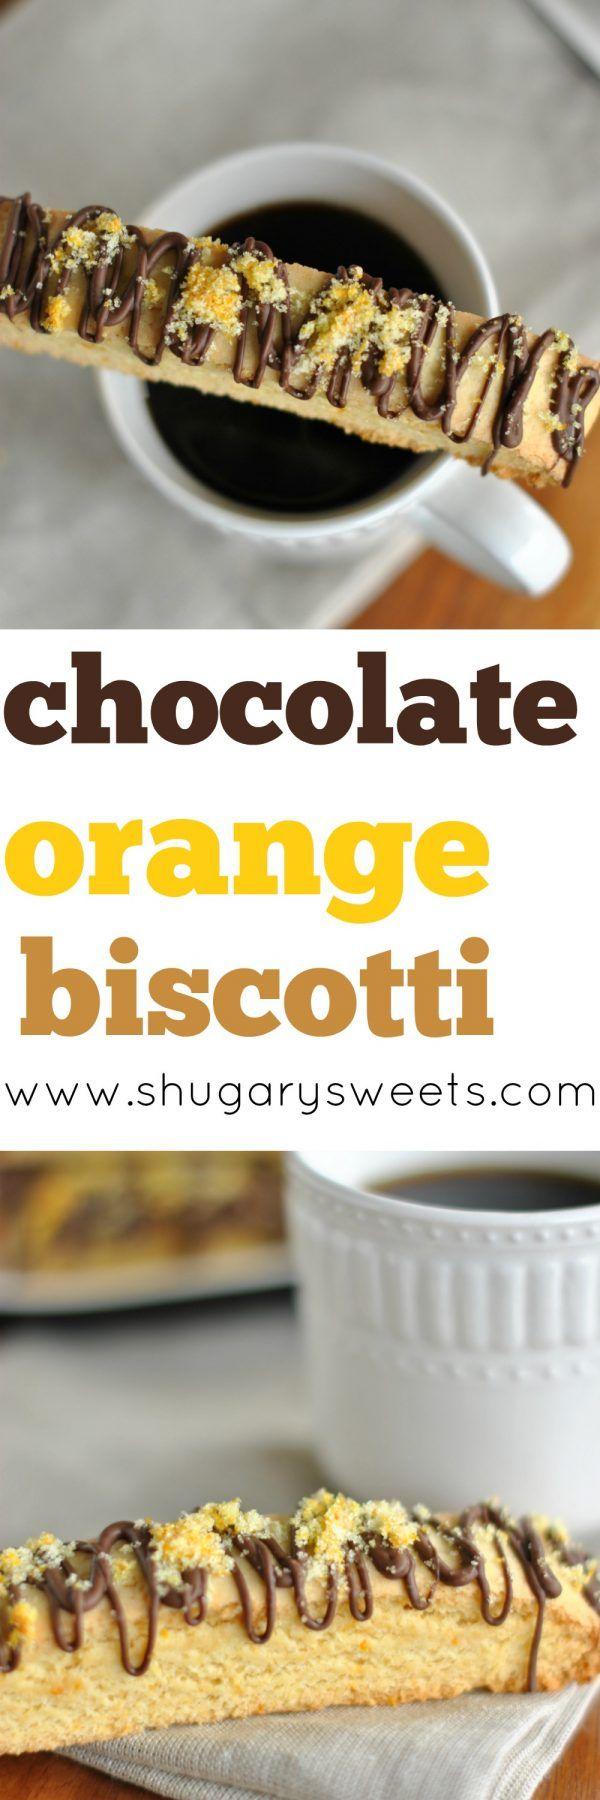 Chocolate Orange Biscotti - Shugary Sweets